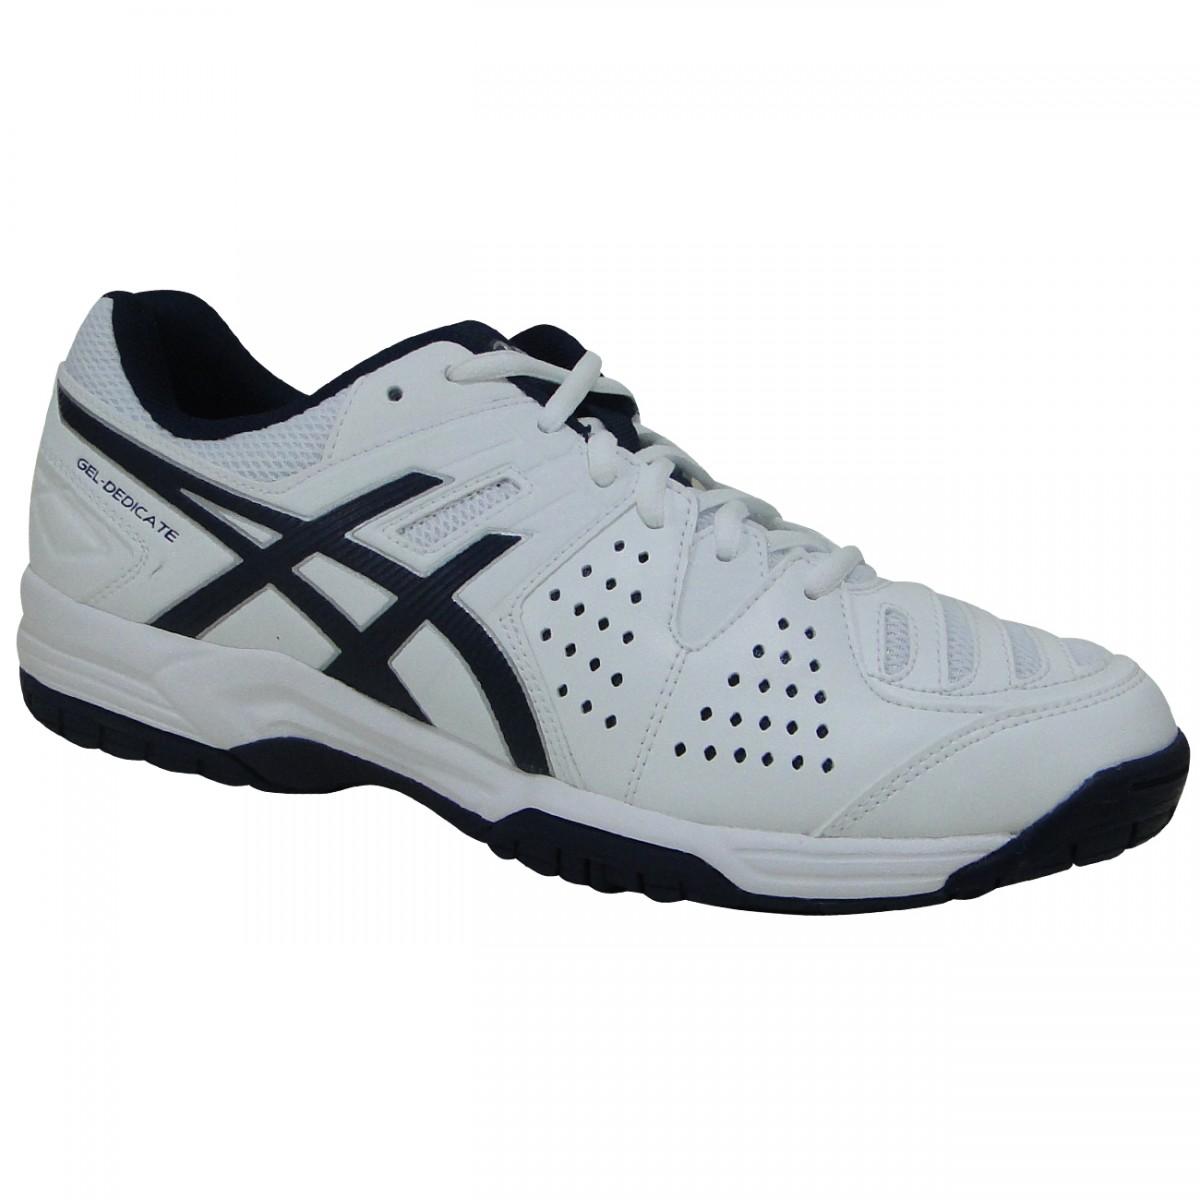 234b799bb00 Tenis Asics Gel-Dedicate 4 E507Y 0150 - Branco Marinho - Chuteira Nike